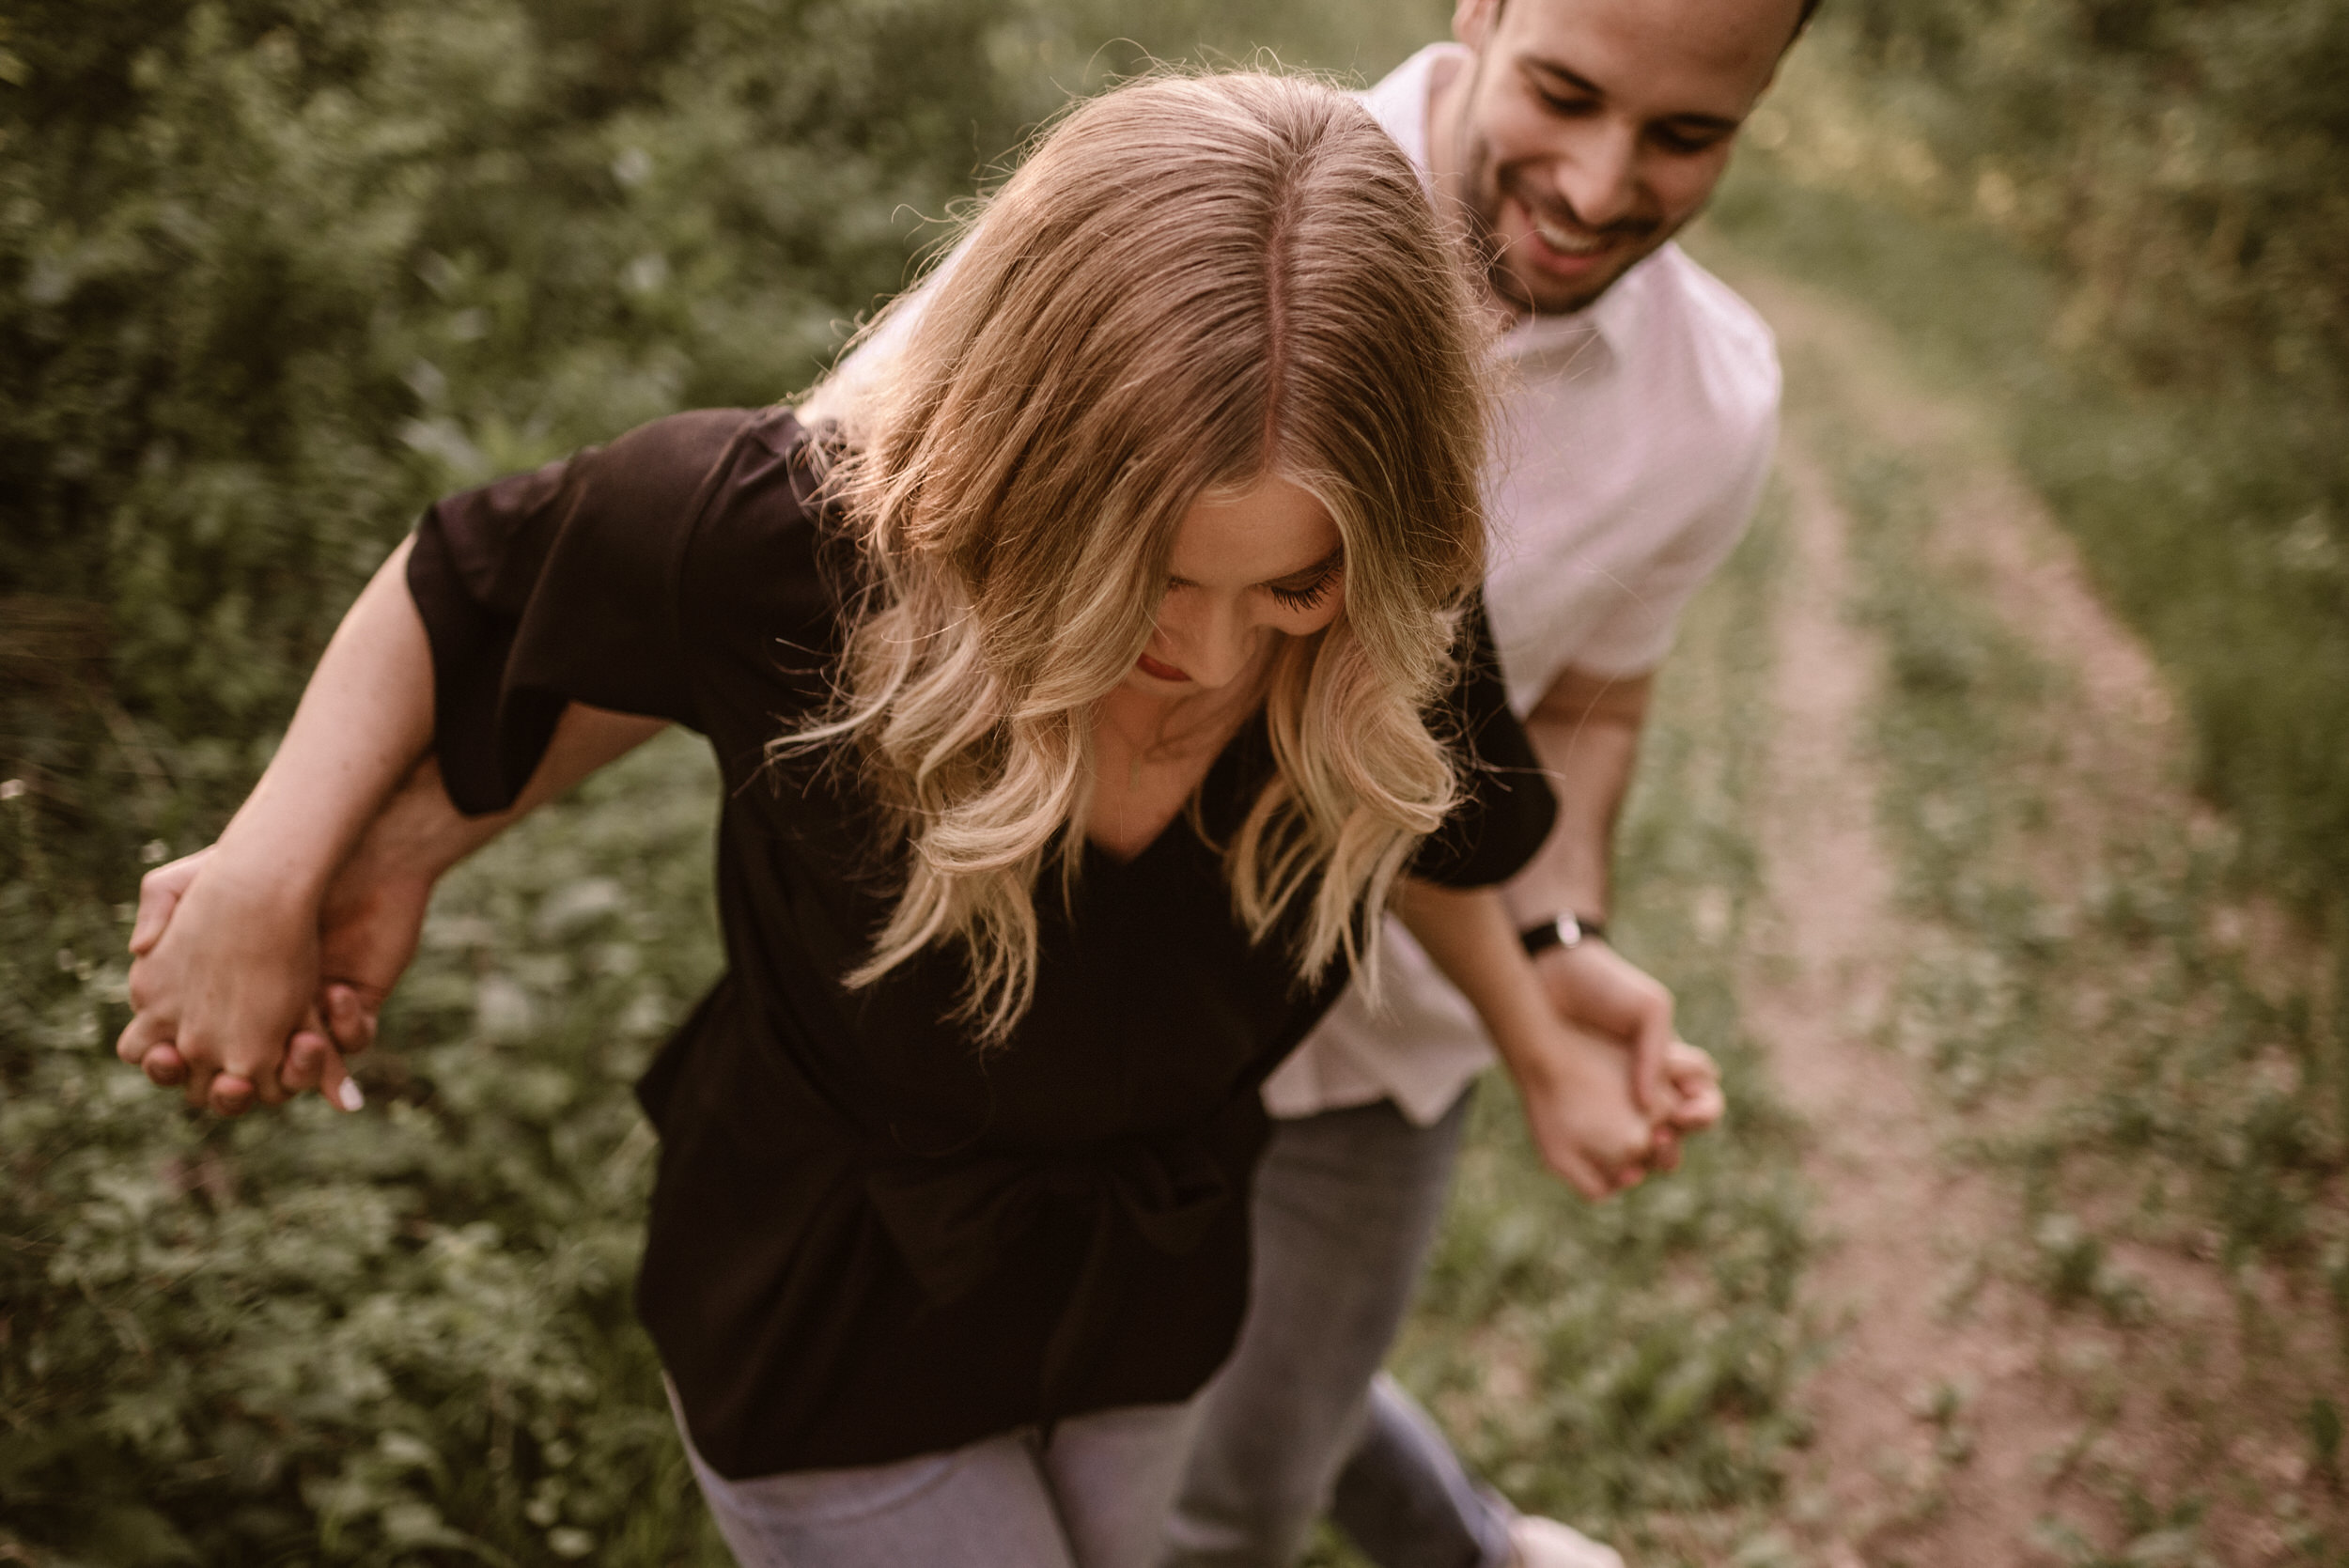 Omaha-Nebraska-Engagement-Session-Kaylie-Sirek-Photography-104.jpg